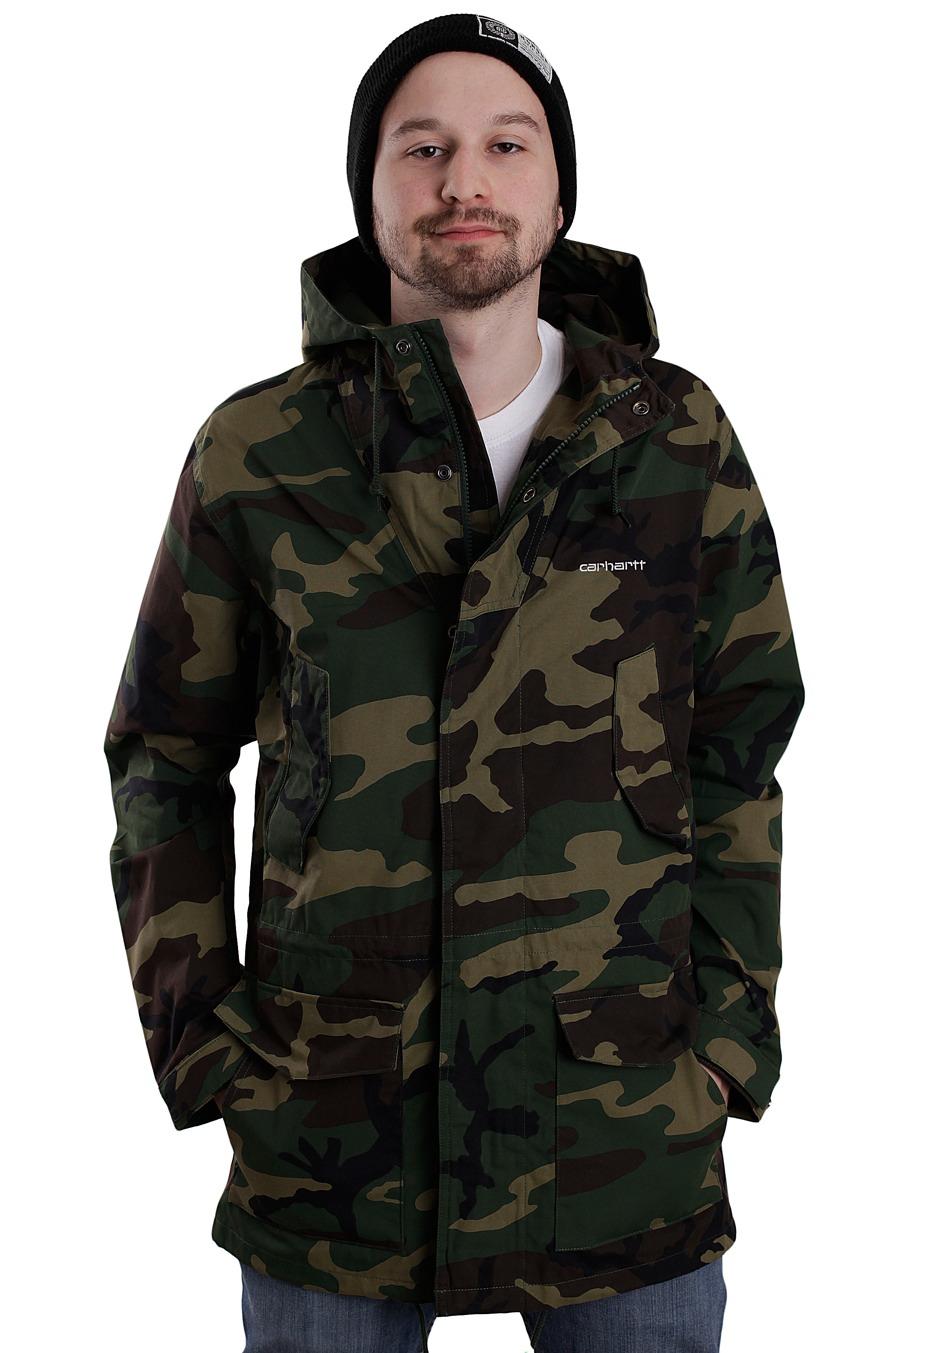 carhartt wip battle camo green rigid parka jacket. Black Bedroom Furniture Sets. Home Design Ideas